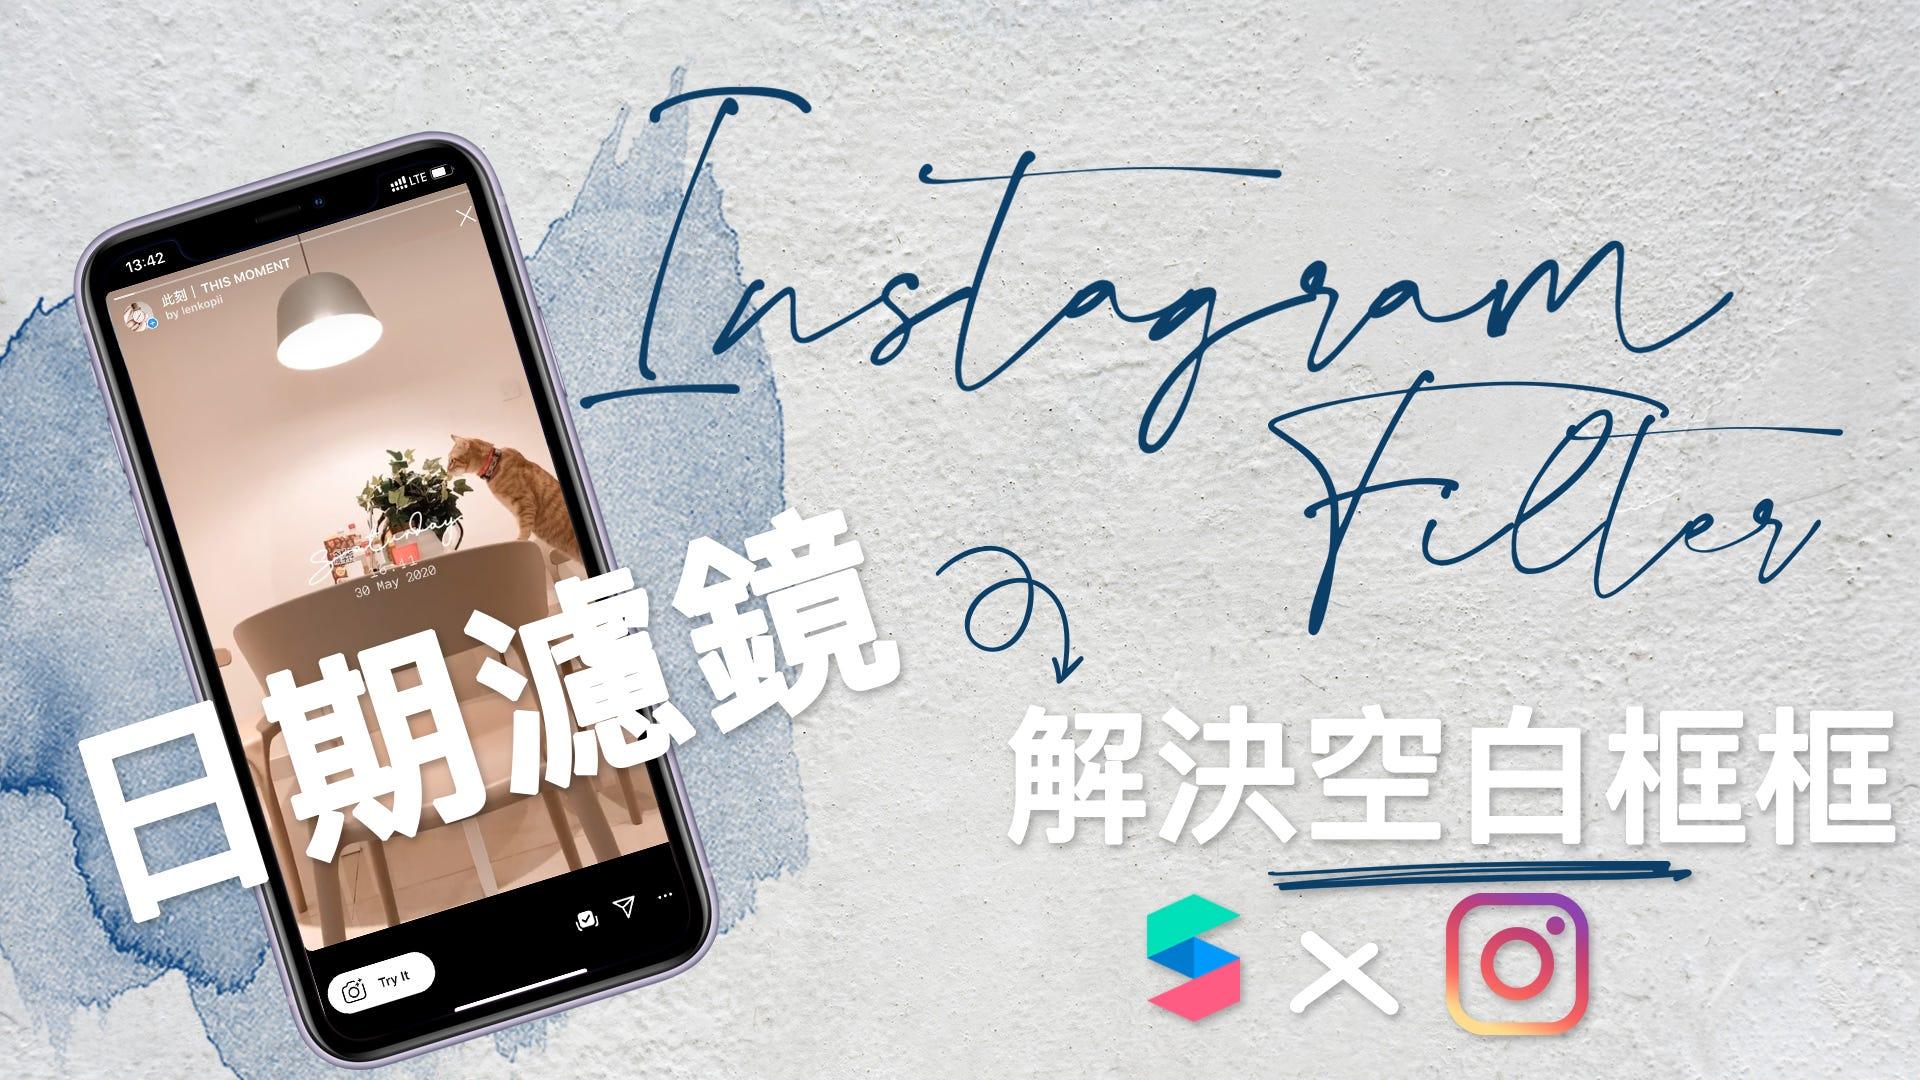 Instagram Filter|如何製作時間日期濾鏡(附影片教學) - LENKOPII DIARY - Medium